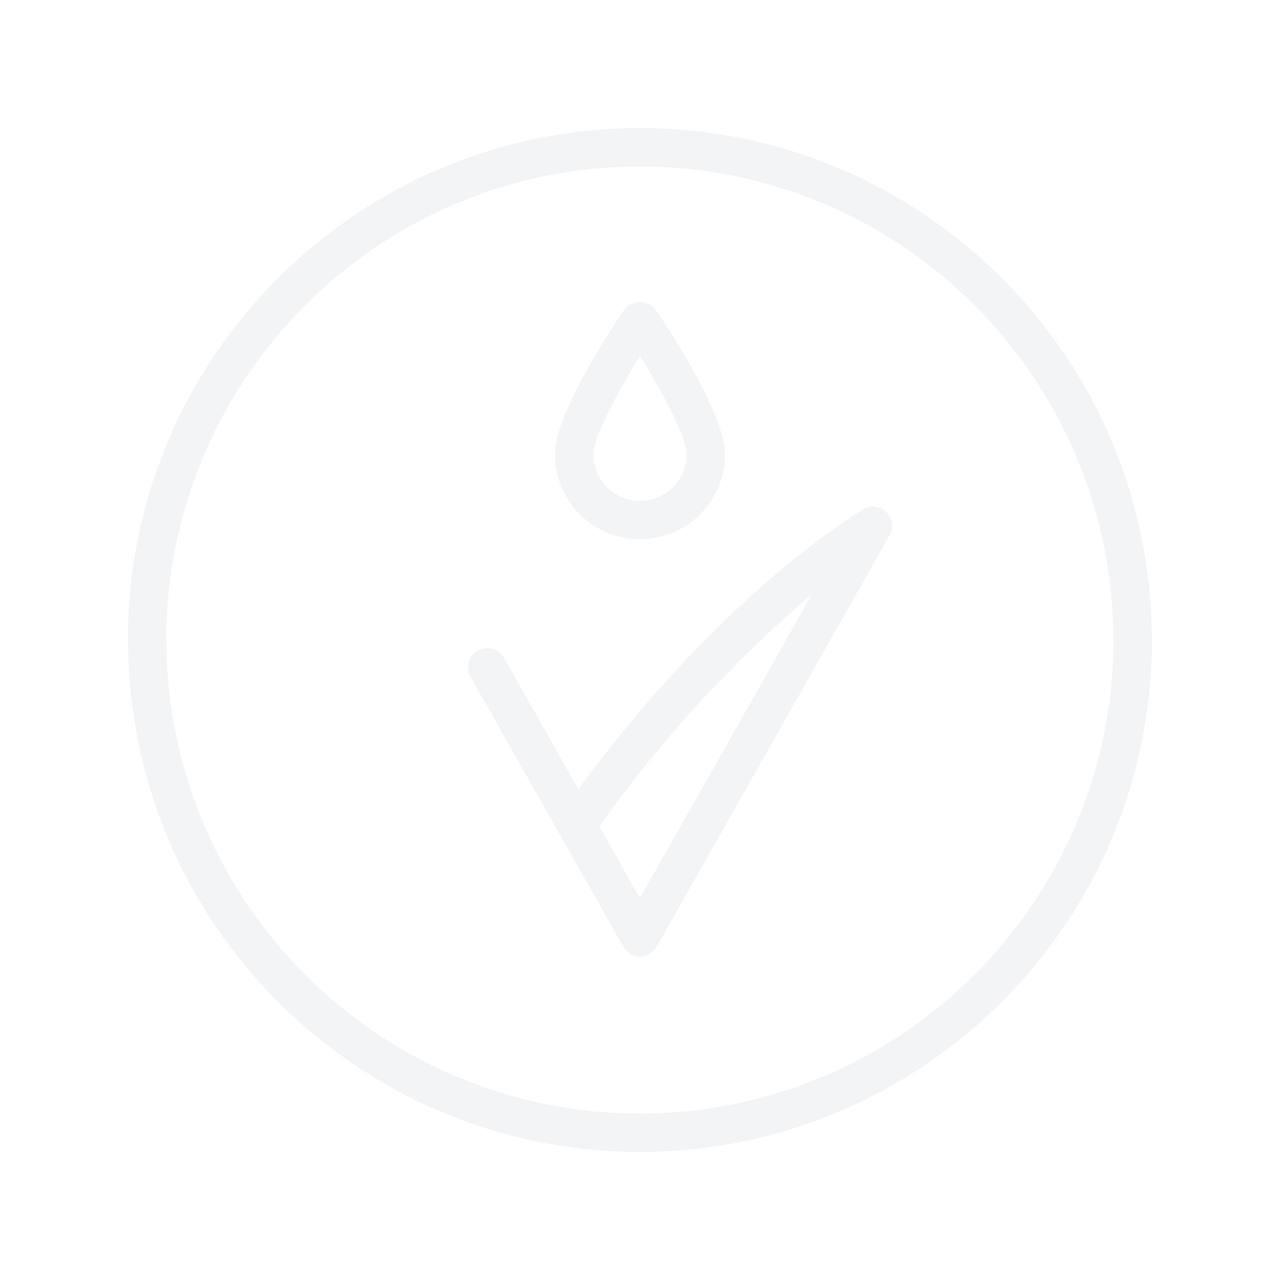 ALESSANDRO Striplac UV/LED Polish Correcting Pen 4.5ml